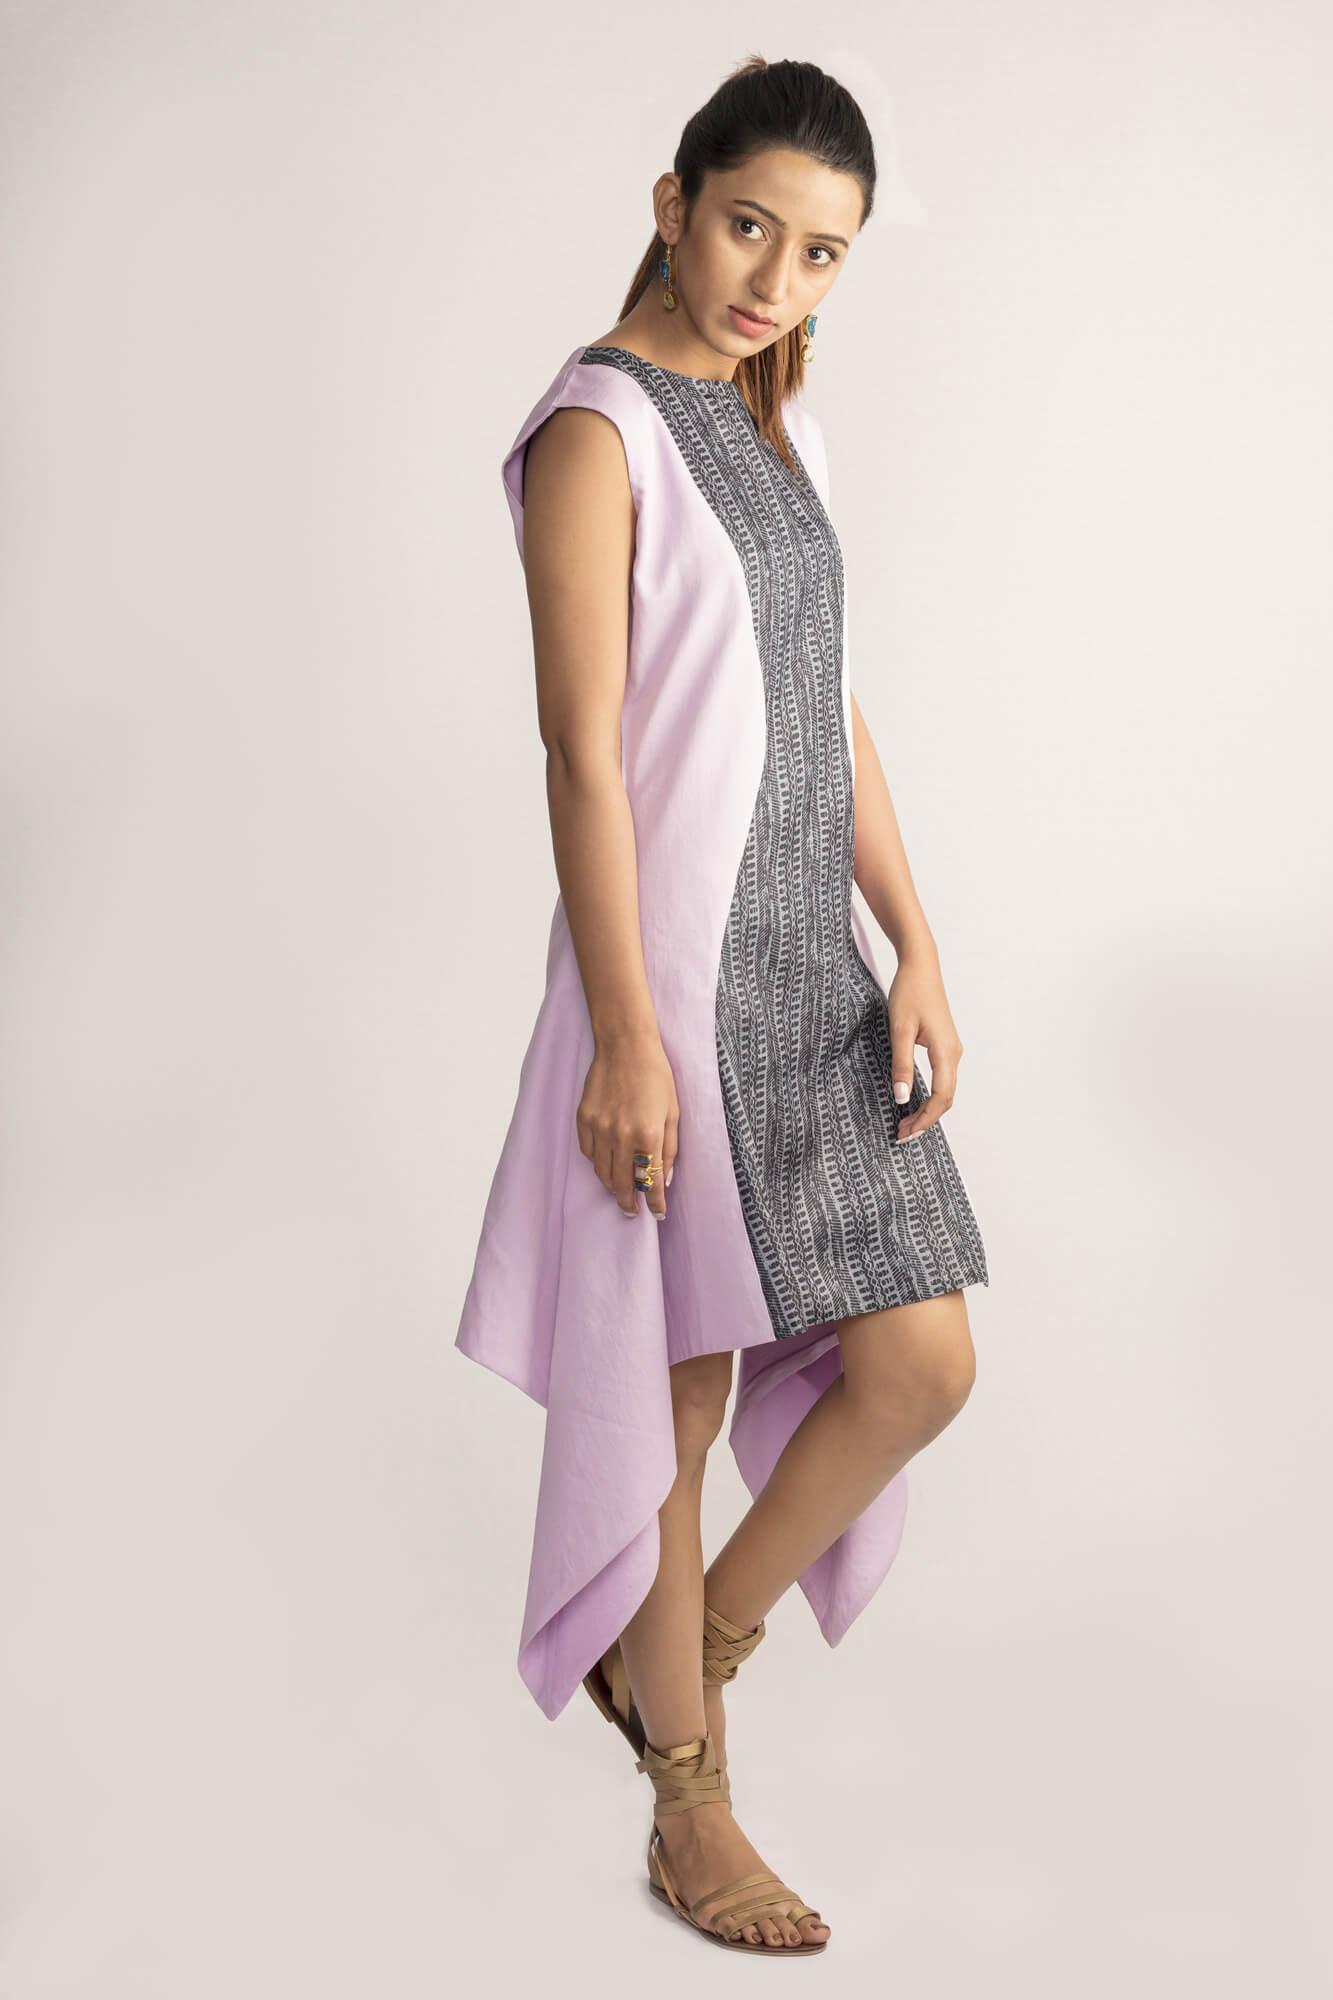 Evensong Asymmetrical Tussar Silk Dress By TAMASQ